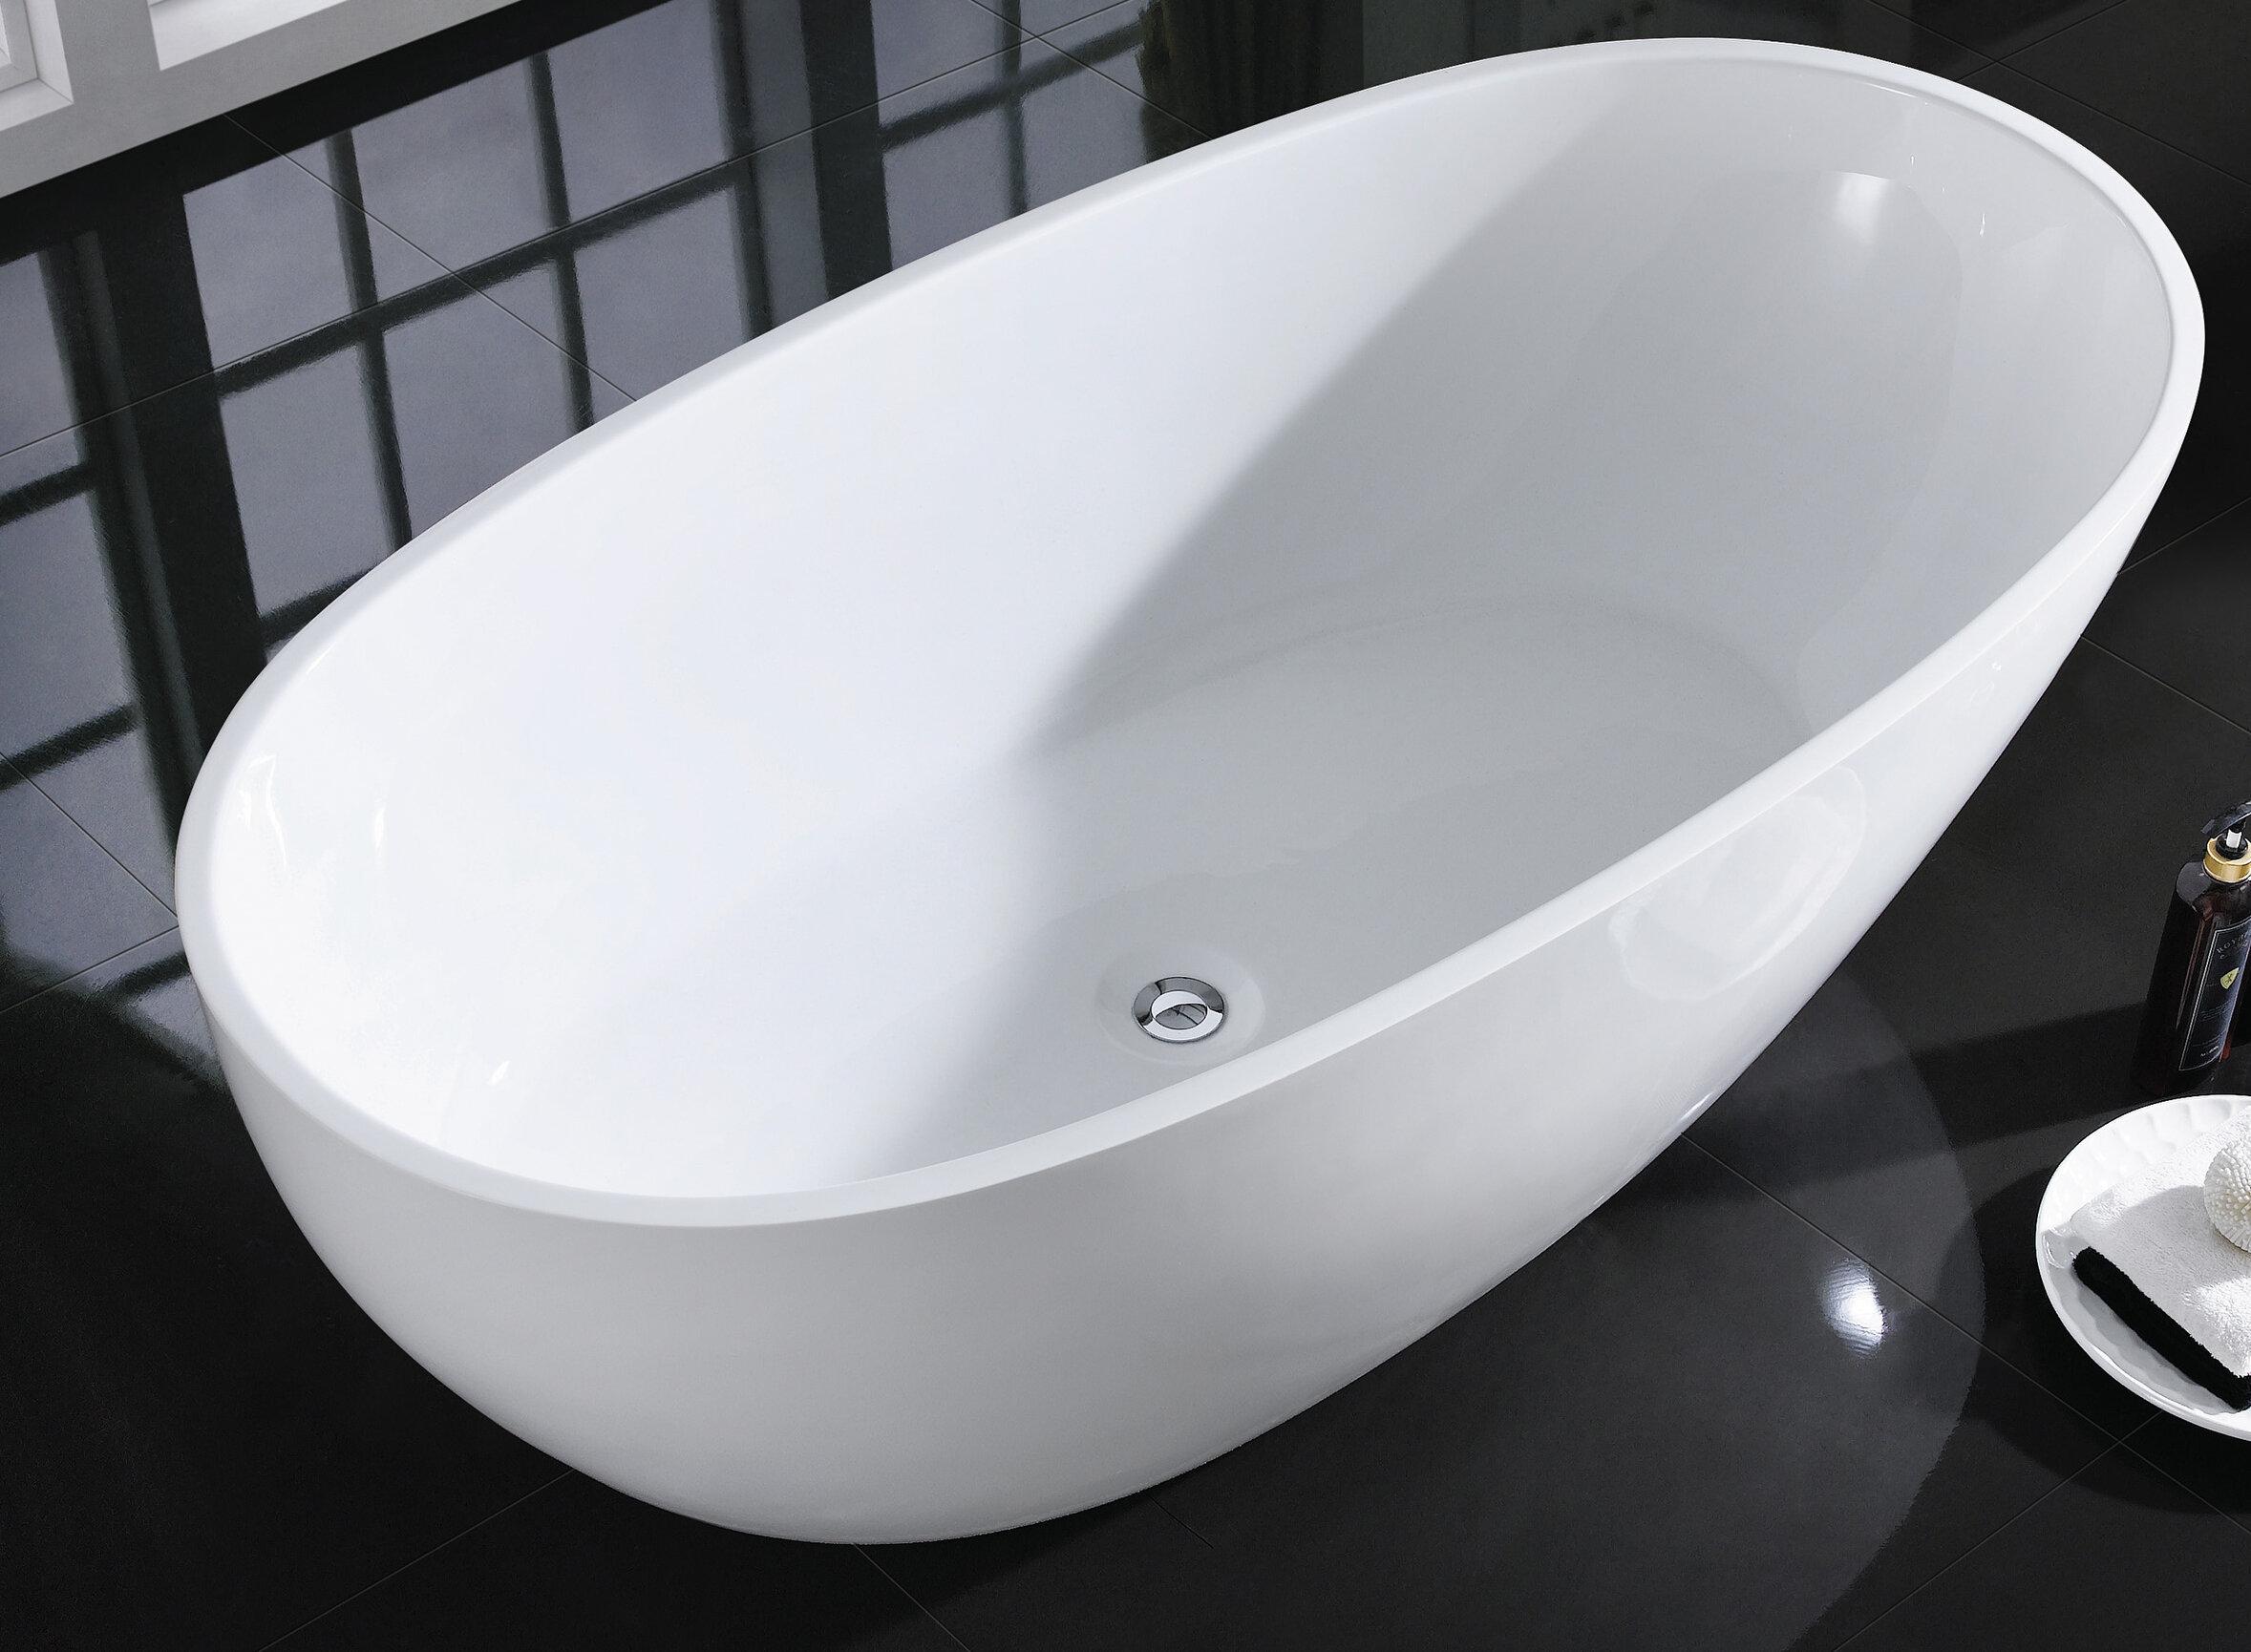 x reviews soaking k pdx bathtub home kohler wayfair alcove improvement bellwether